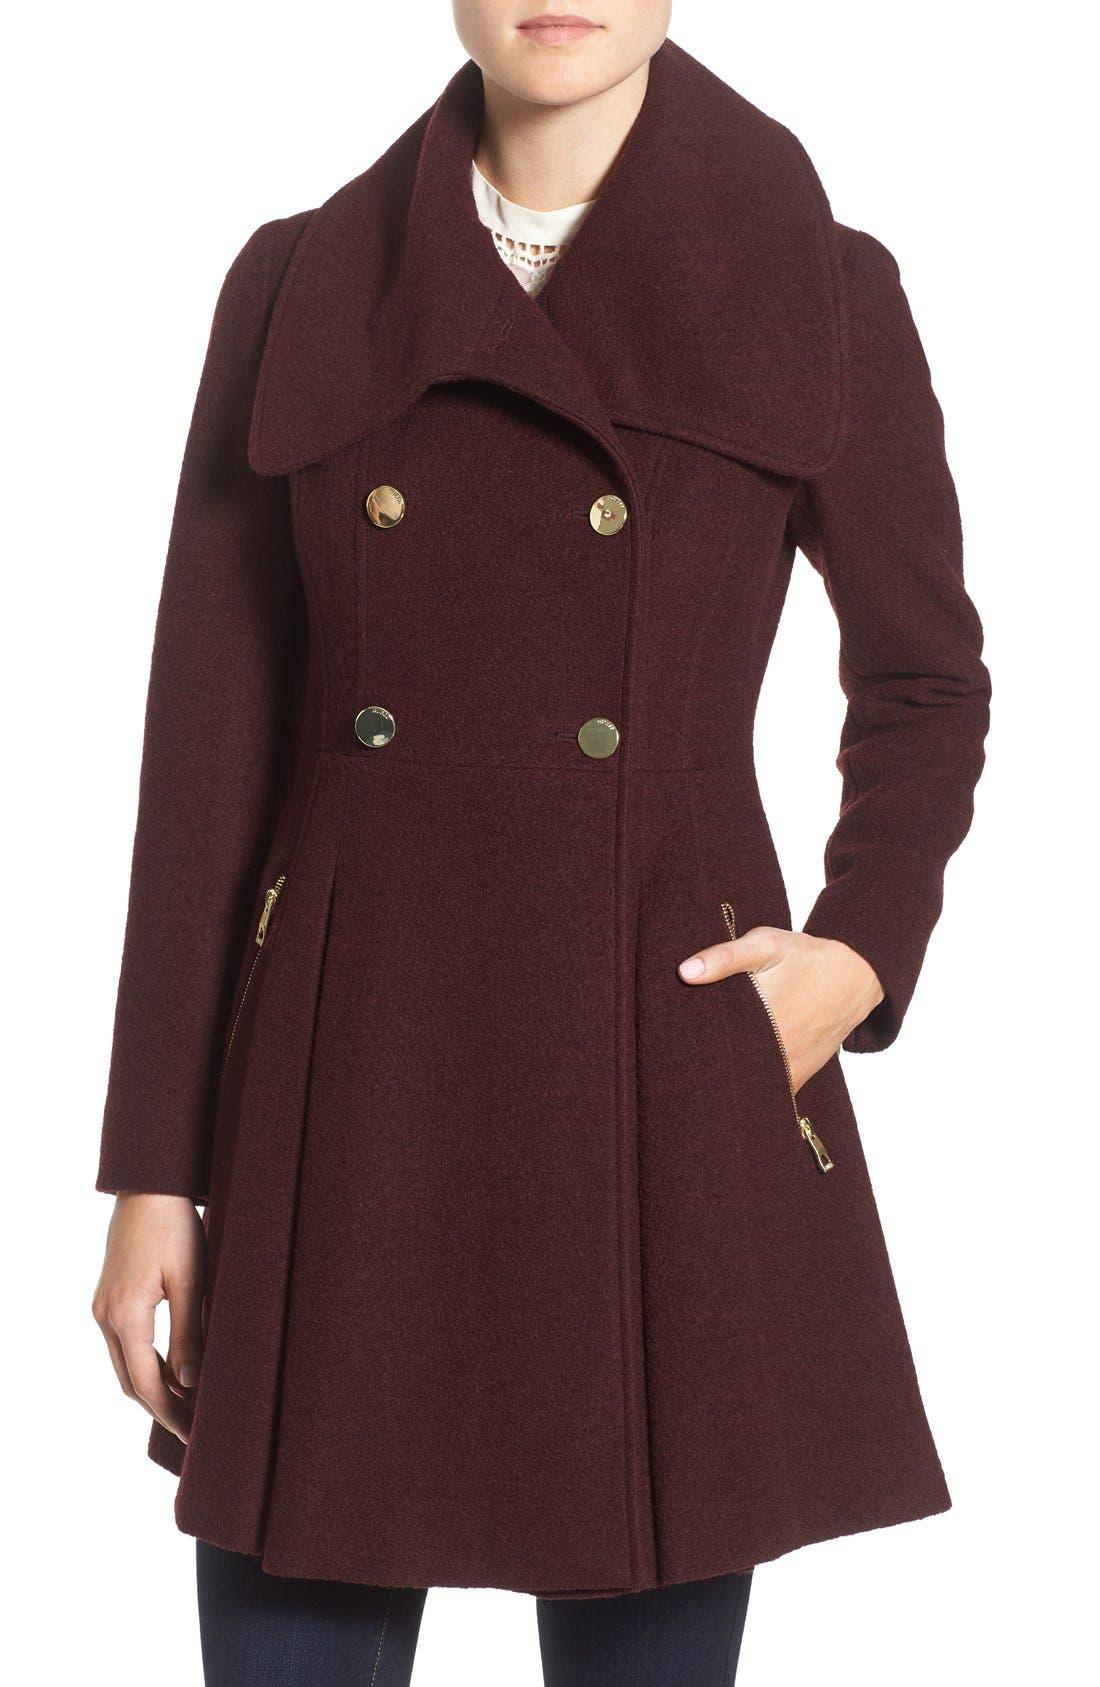 GUESS Envelope Collar Double Breasted Coat (Regular & Petite)